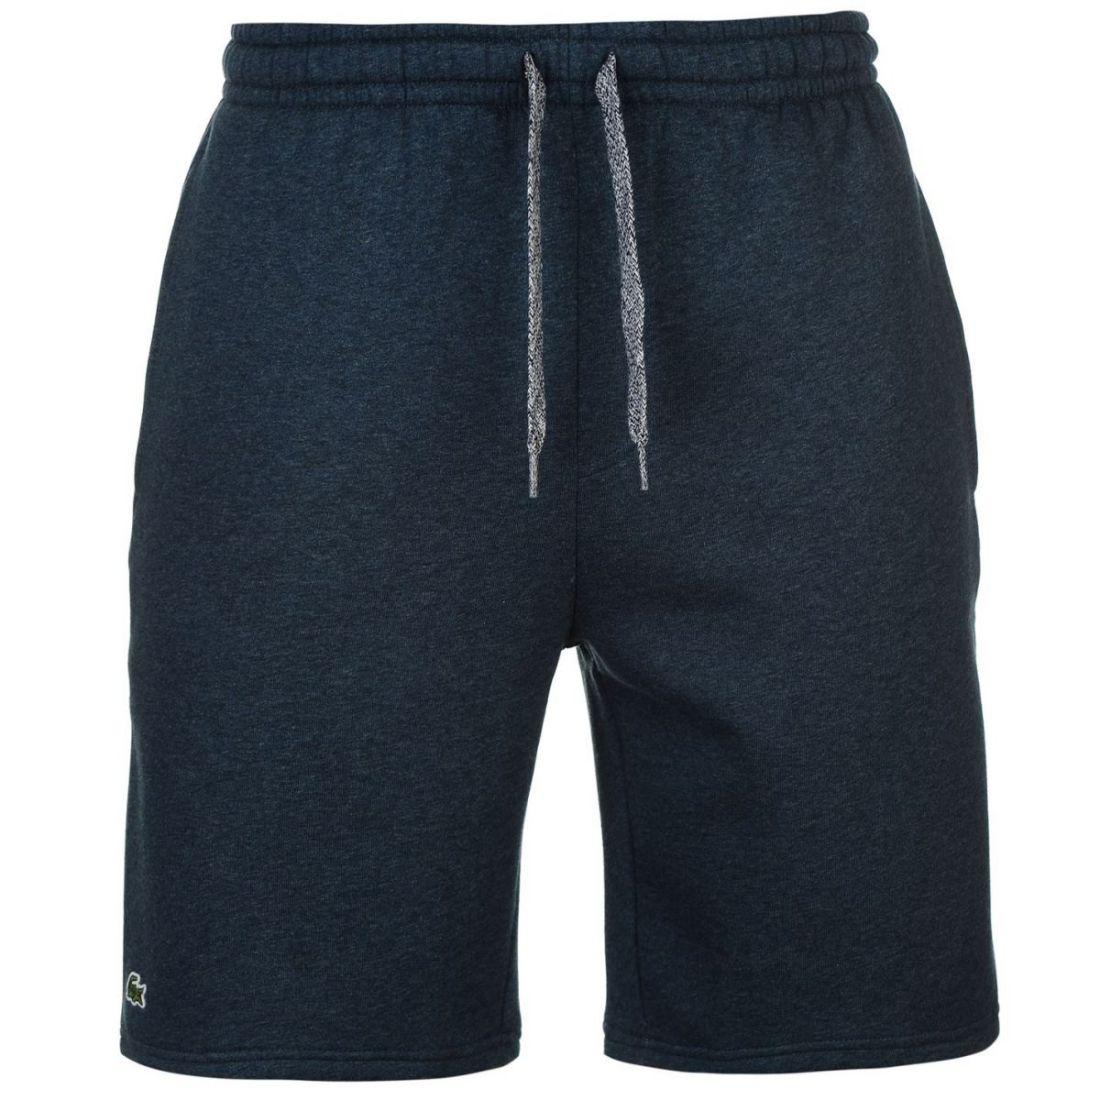 Lacoste-Fleece-Jogger-Shorts-Mens thumbnail 2